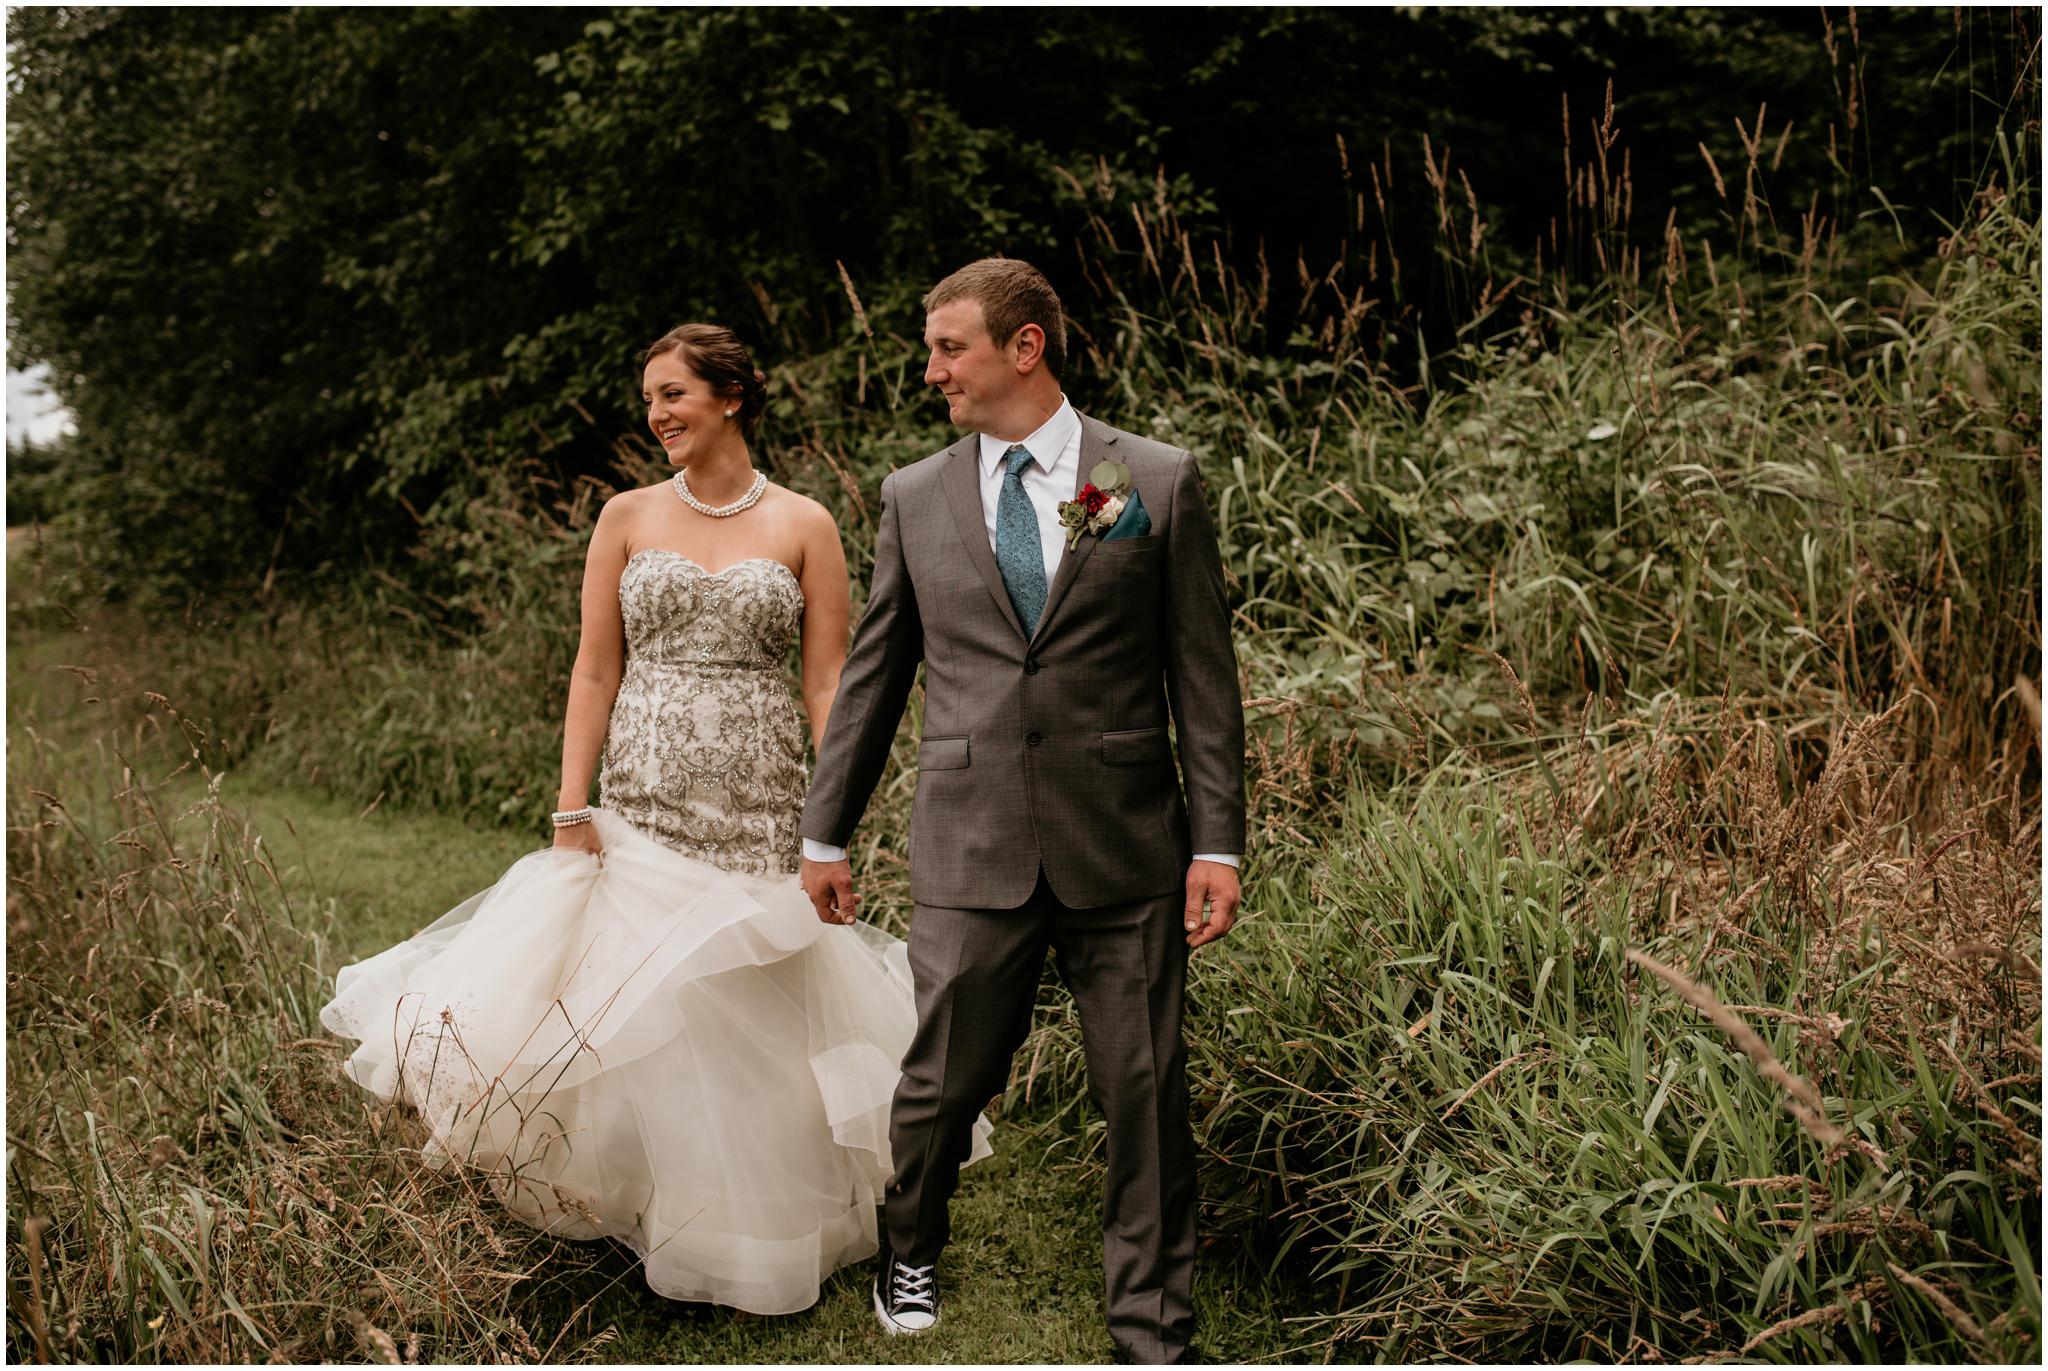 alex-and-matthew-three-cs-farm-venue-seattle-wedding-photographer-061.jpg